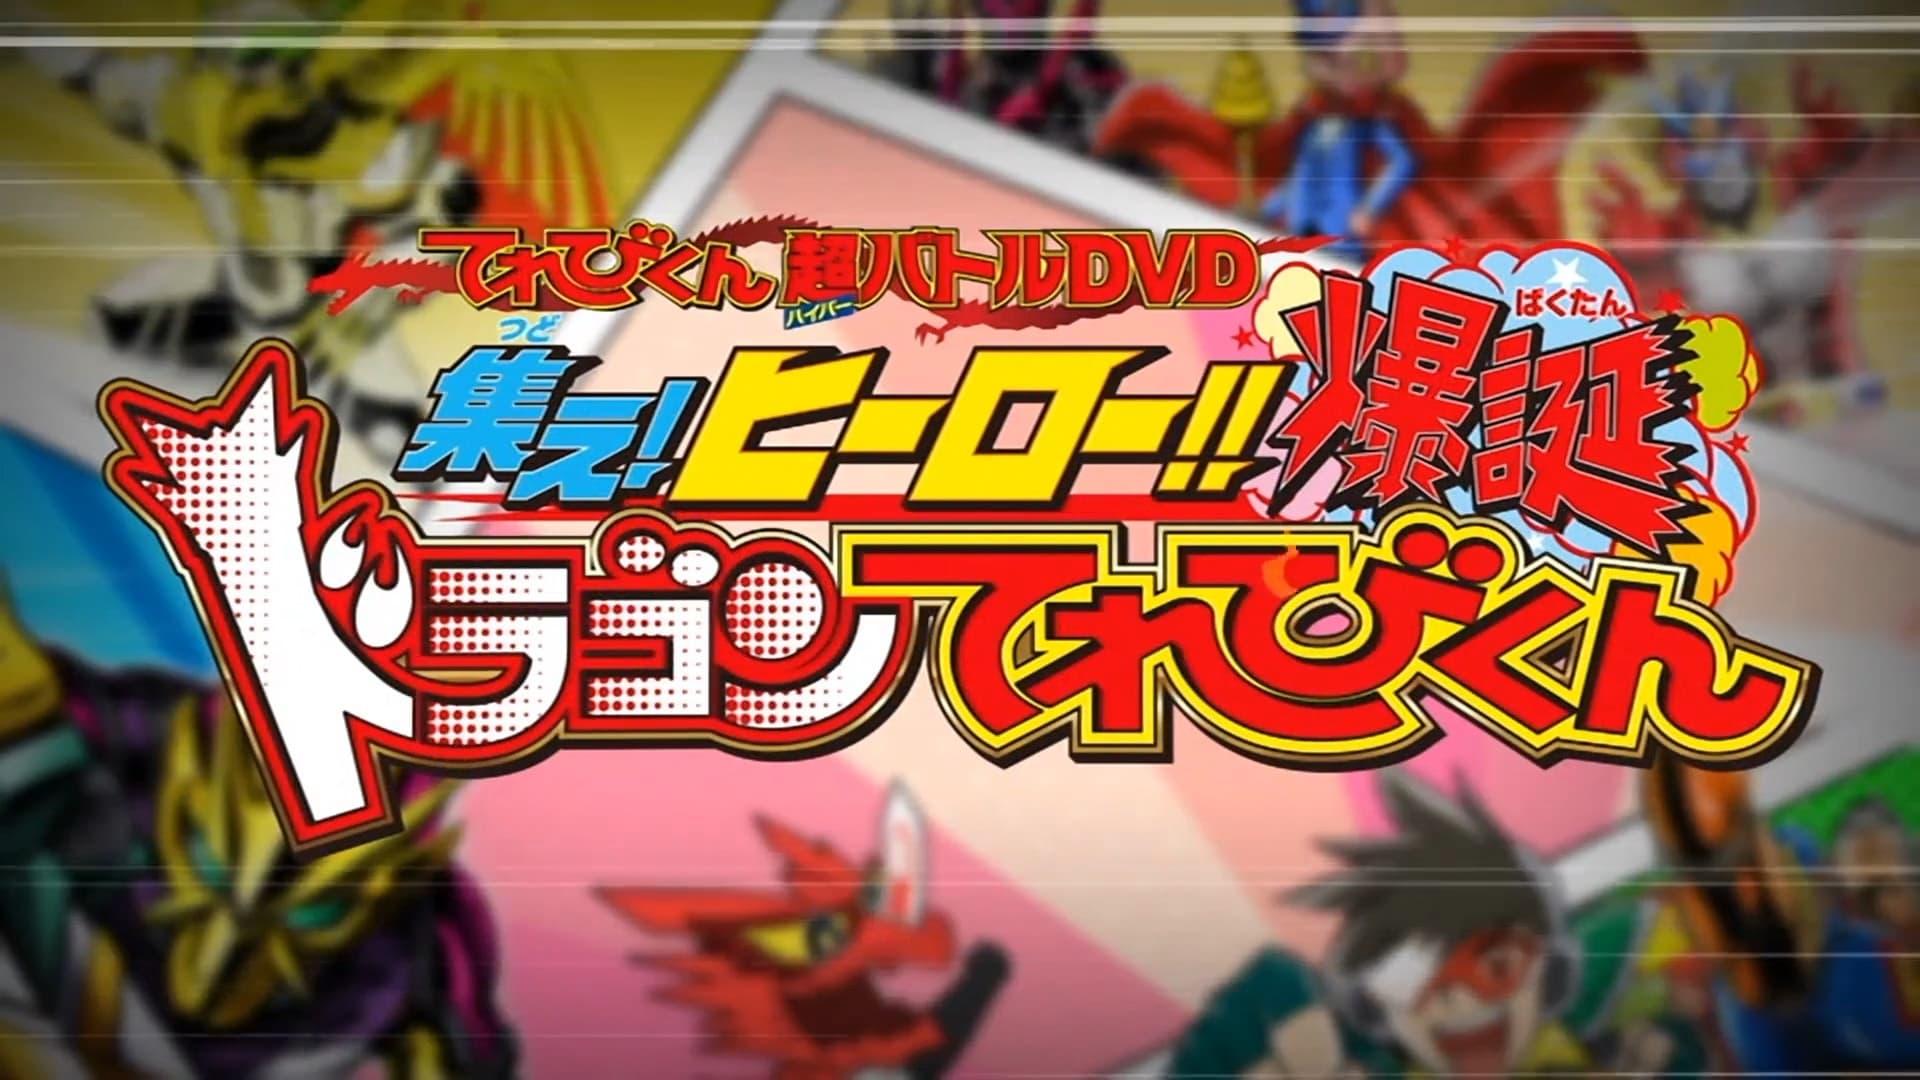 Kamen Rider Saber: Gather! Hero! The Explosive Dragon TVKun (2021) Movie English Full Movie Watch Online Free